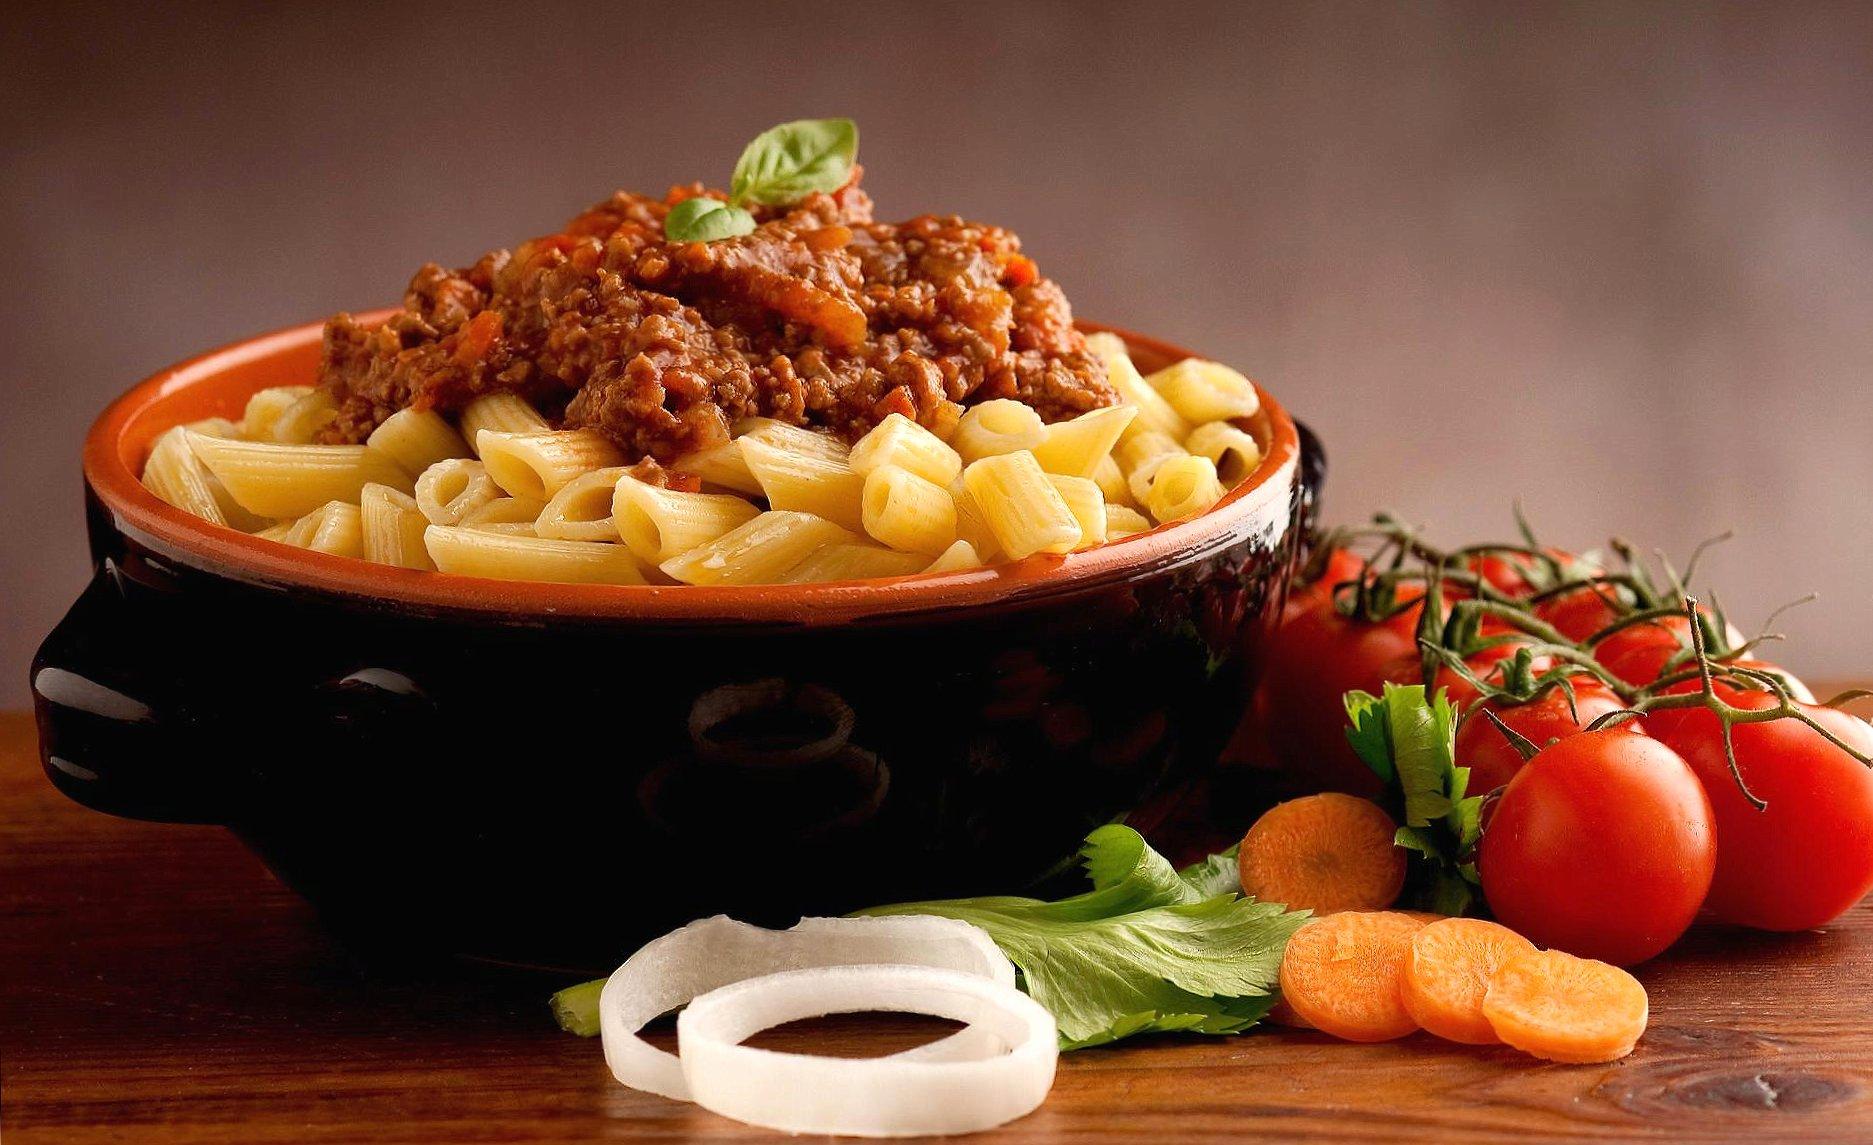 Penne al ragu pasta italy food wallpapers HD quality